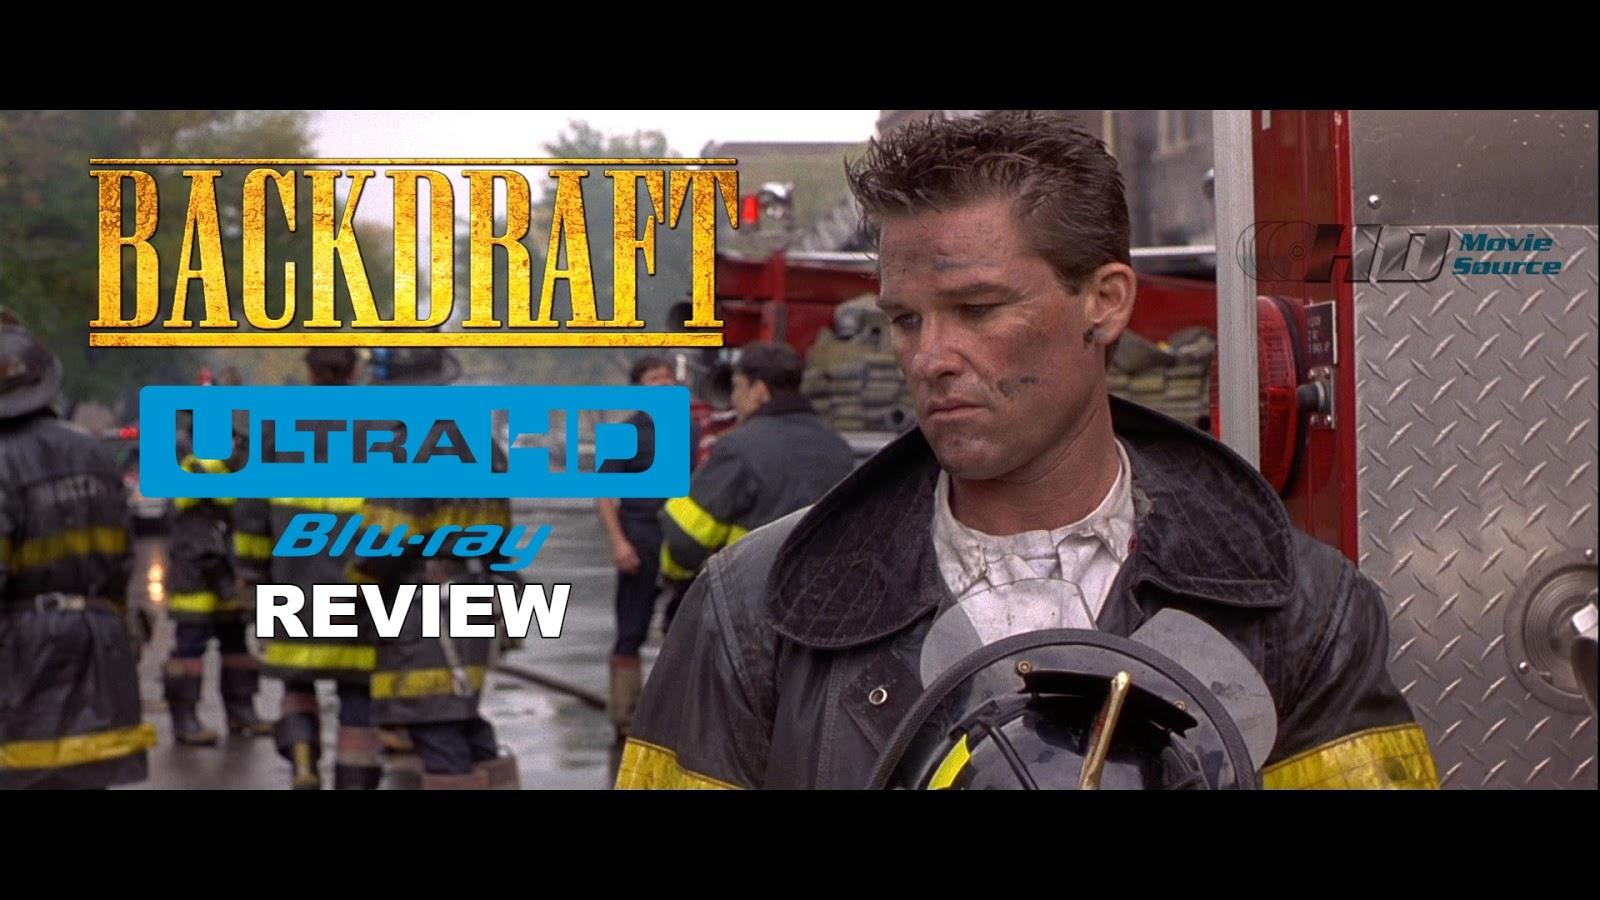 Backdraft (1991) 4K Ultra HD Blu-ray Blu-ray Review